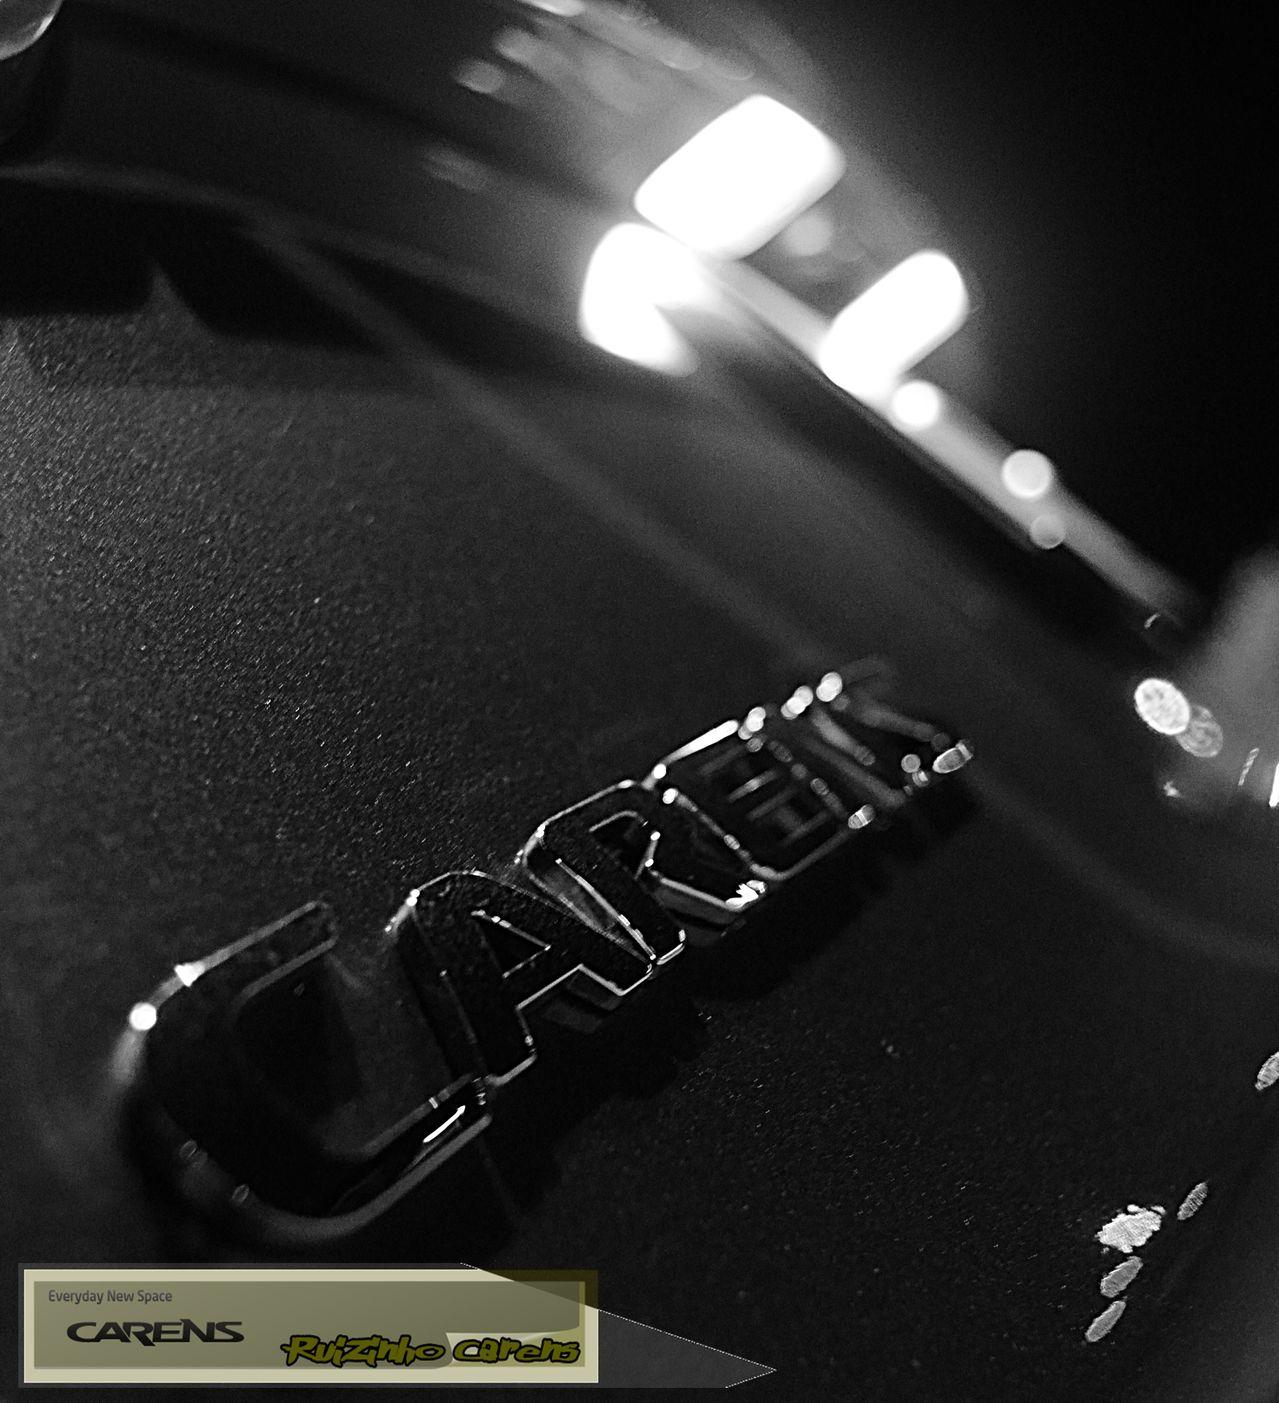 Kia Carens 1.7 TX CRDI 136cv e Kia Cee'd 1.6 CRDI 5p. - DO RUIZINHO  - Página 5 DSC_0184